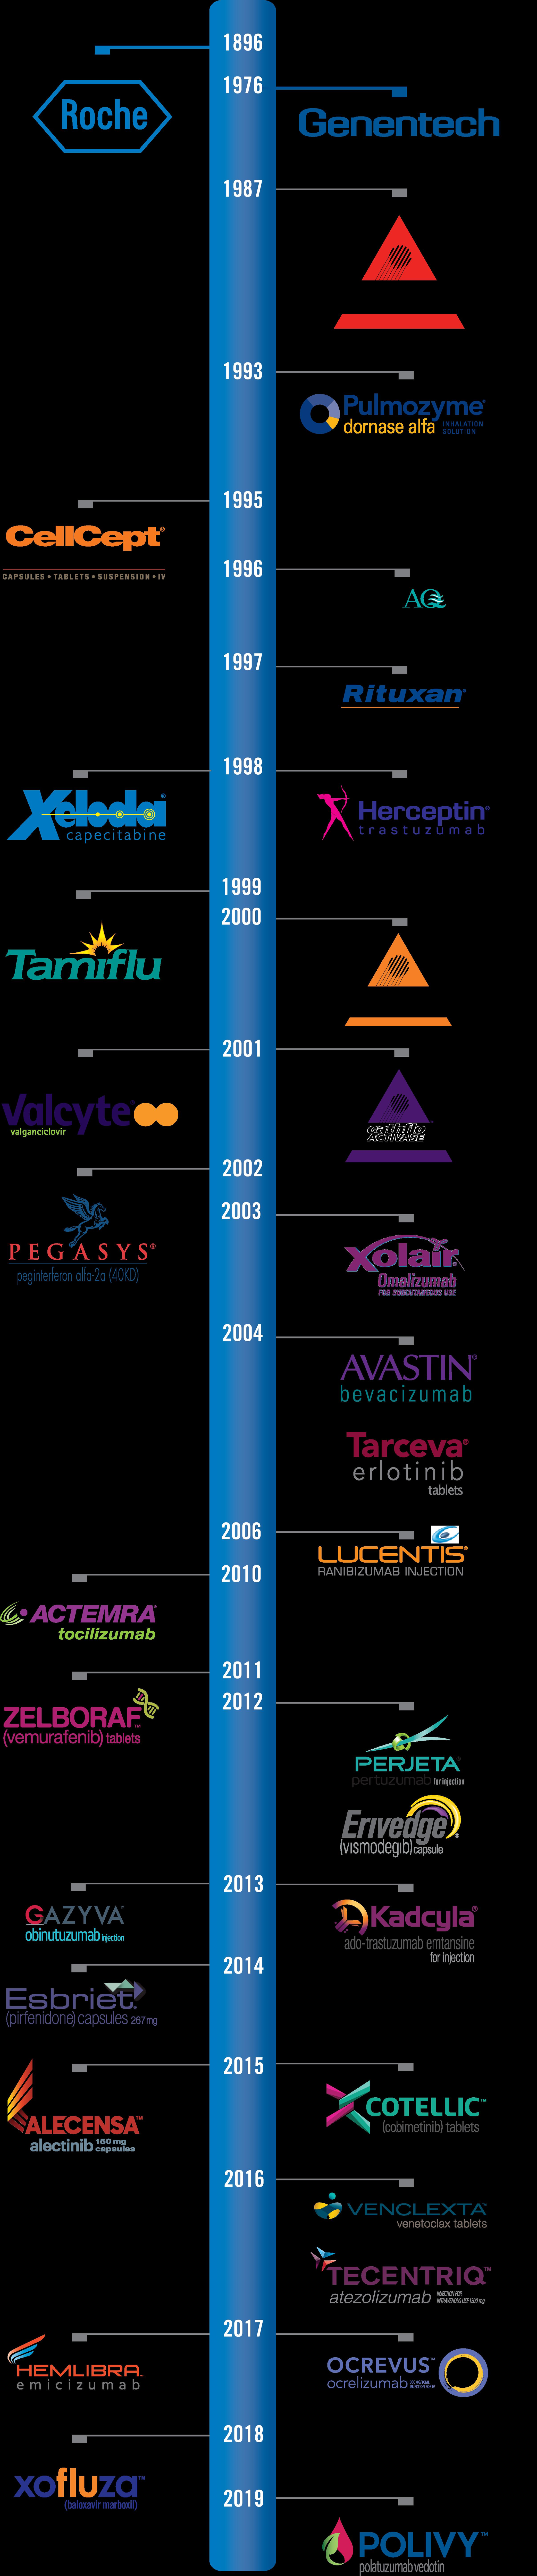 Genentech: Approvals Timeline